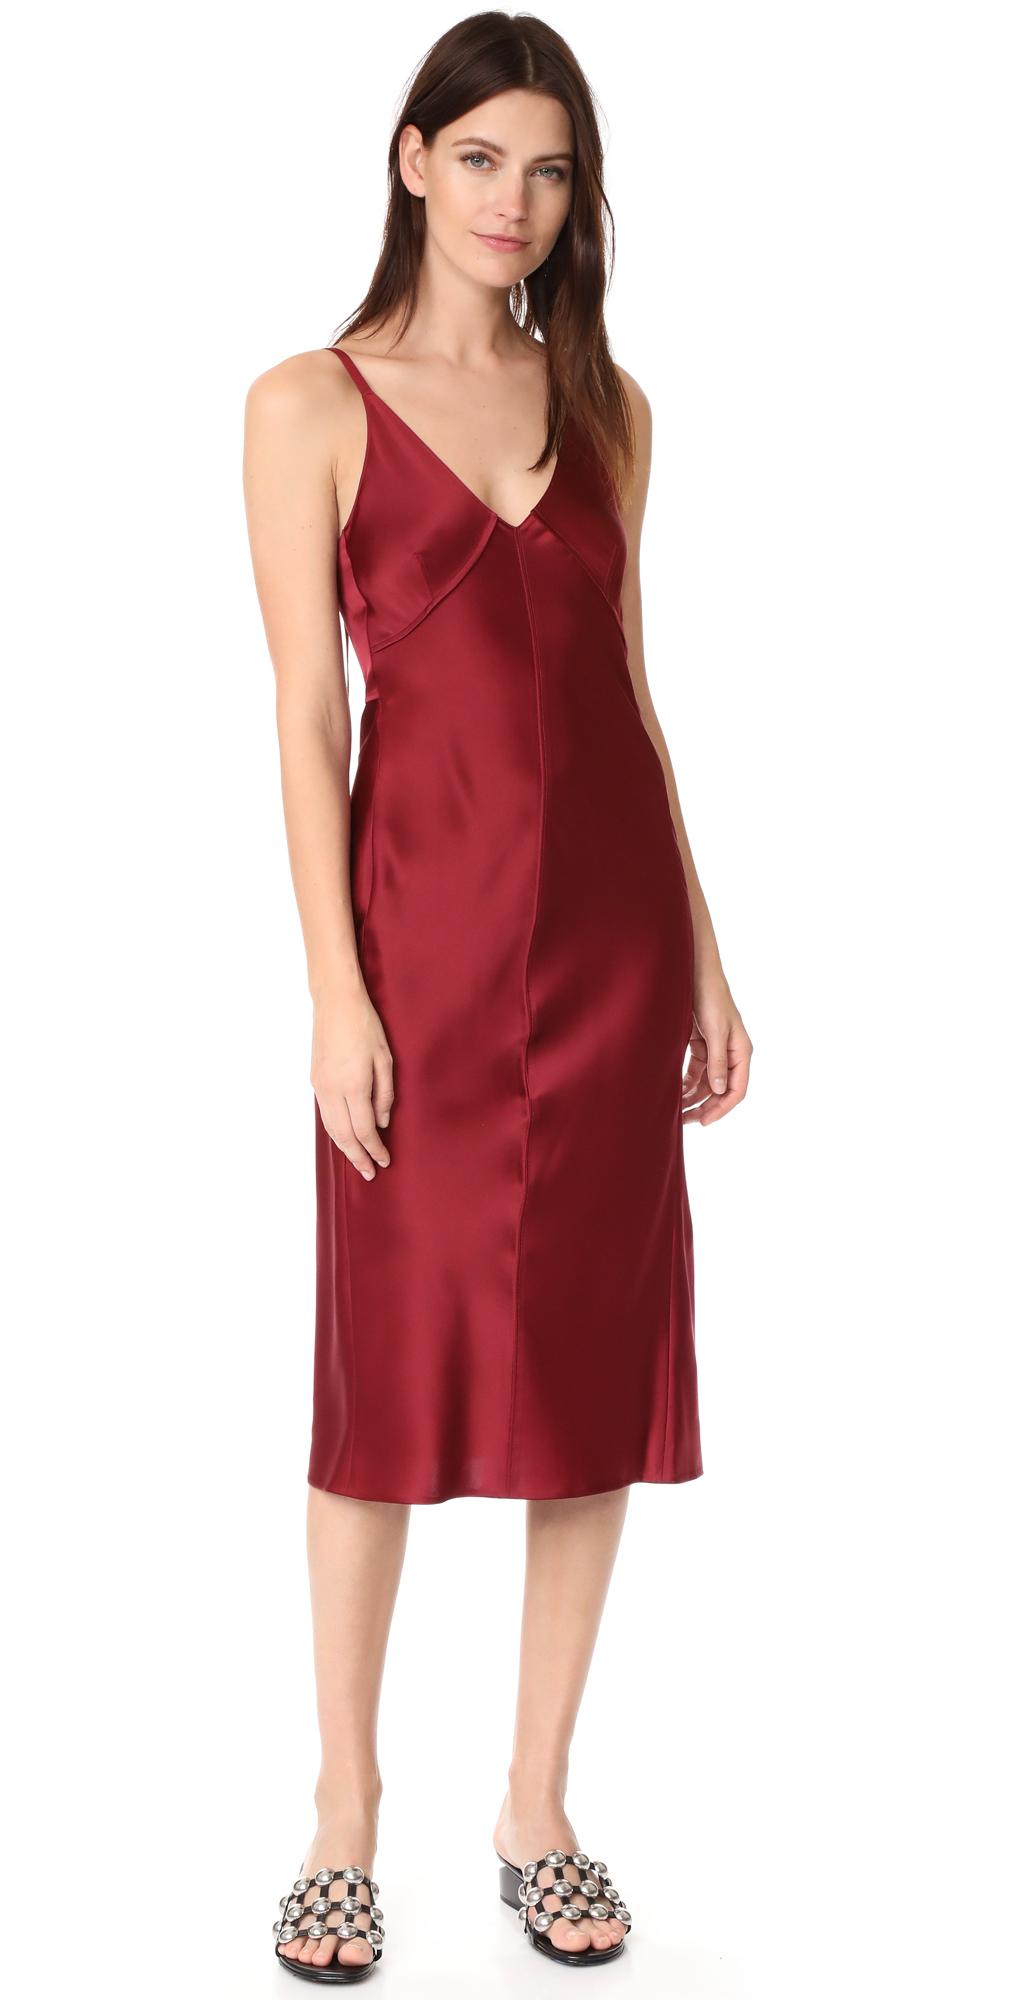 Deconstructed Slip Dress Helmut Lang